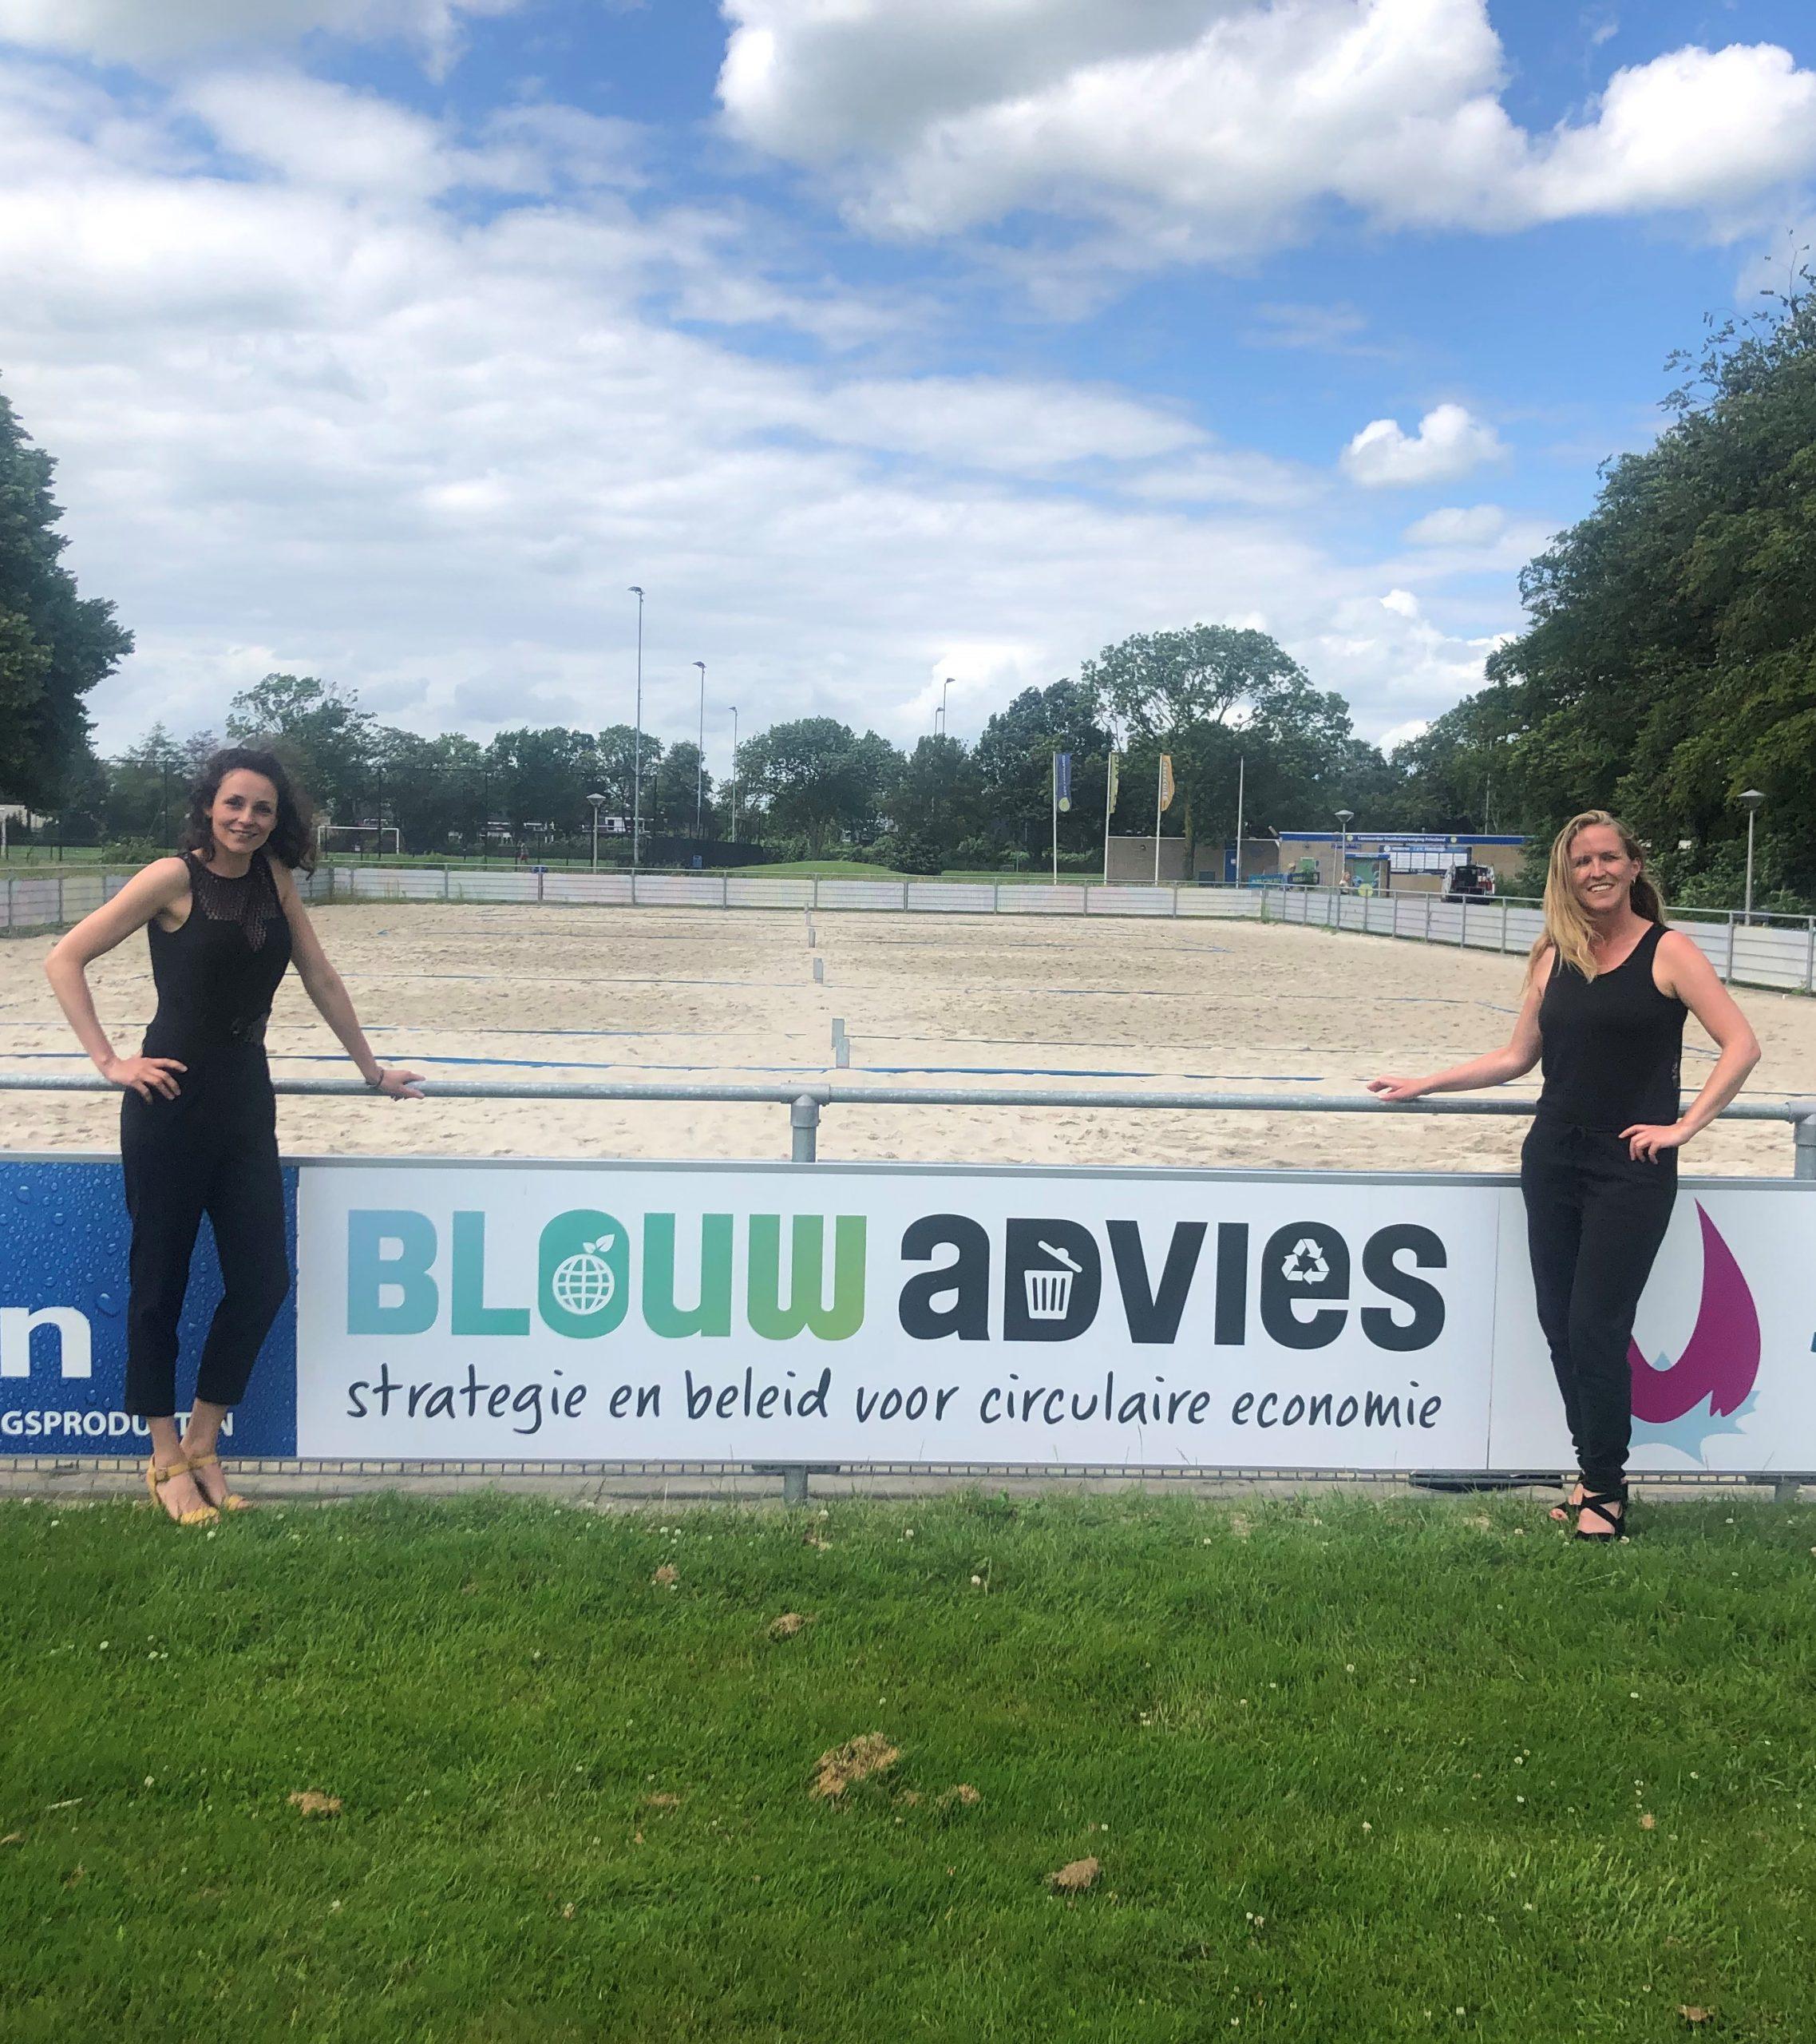 Blouw advies sponsorbord BL